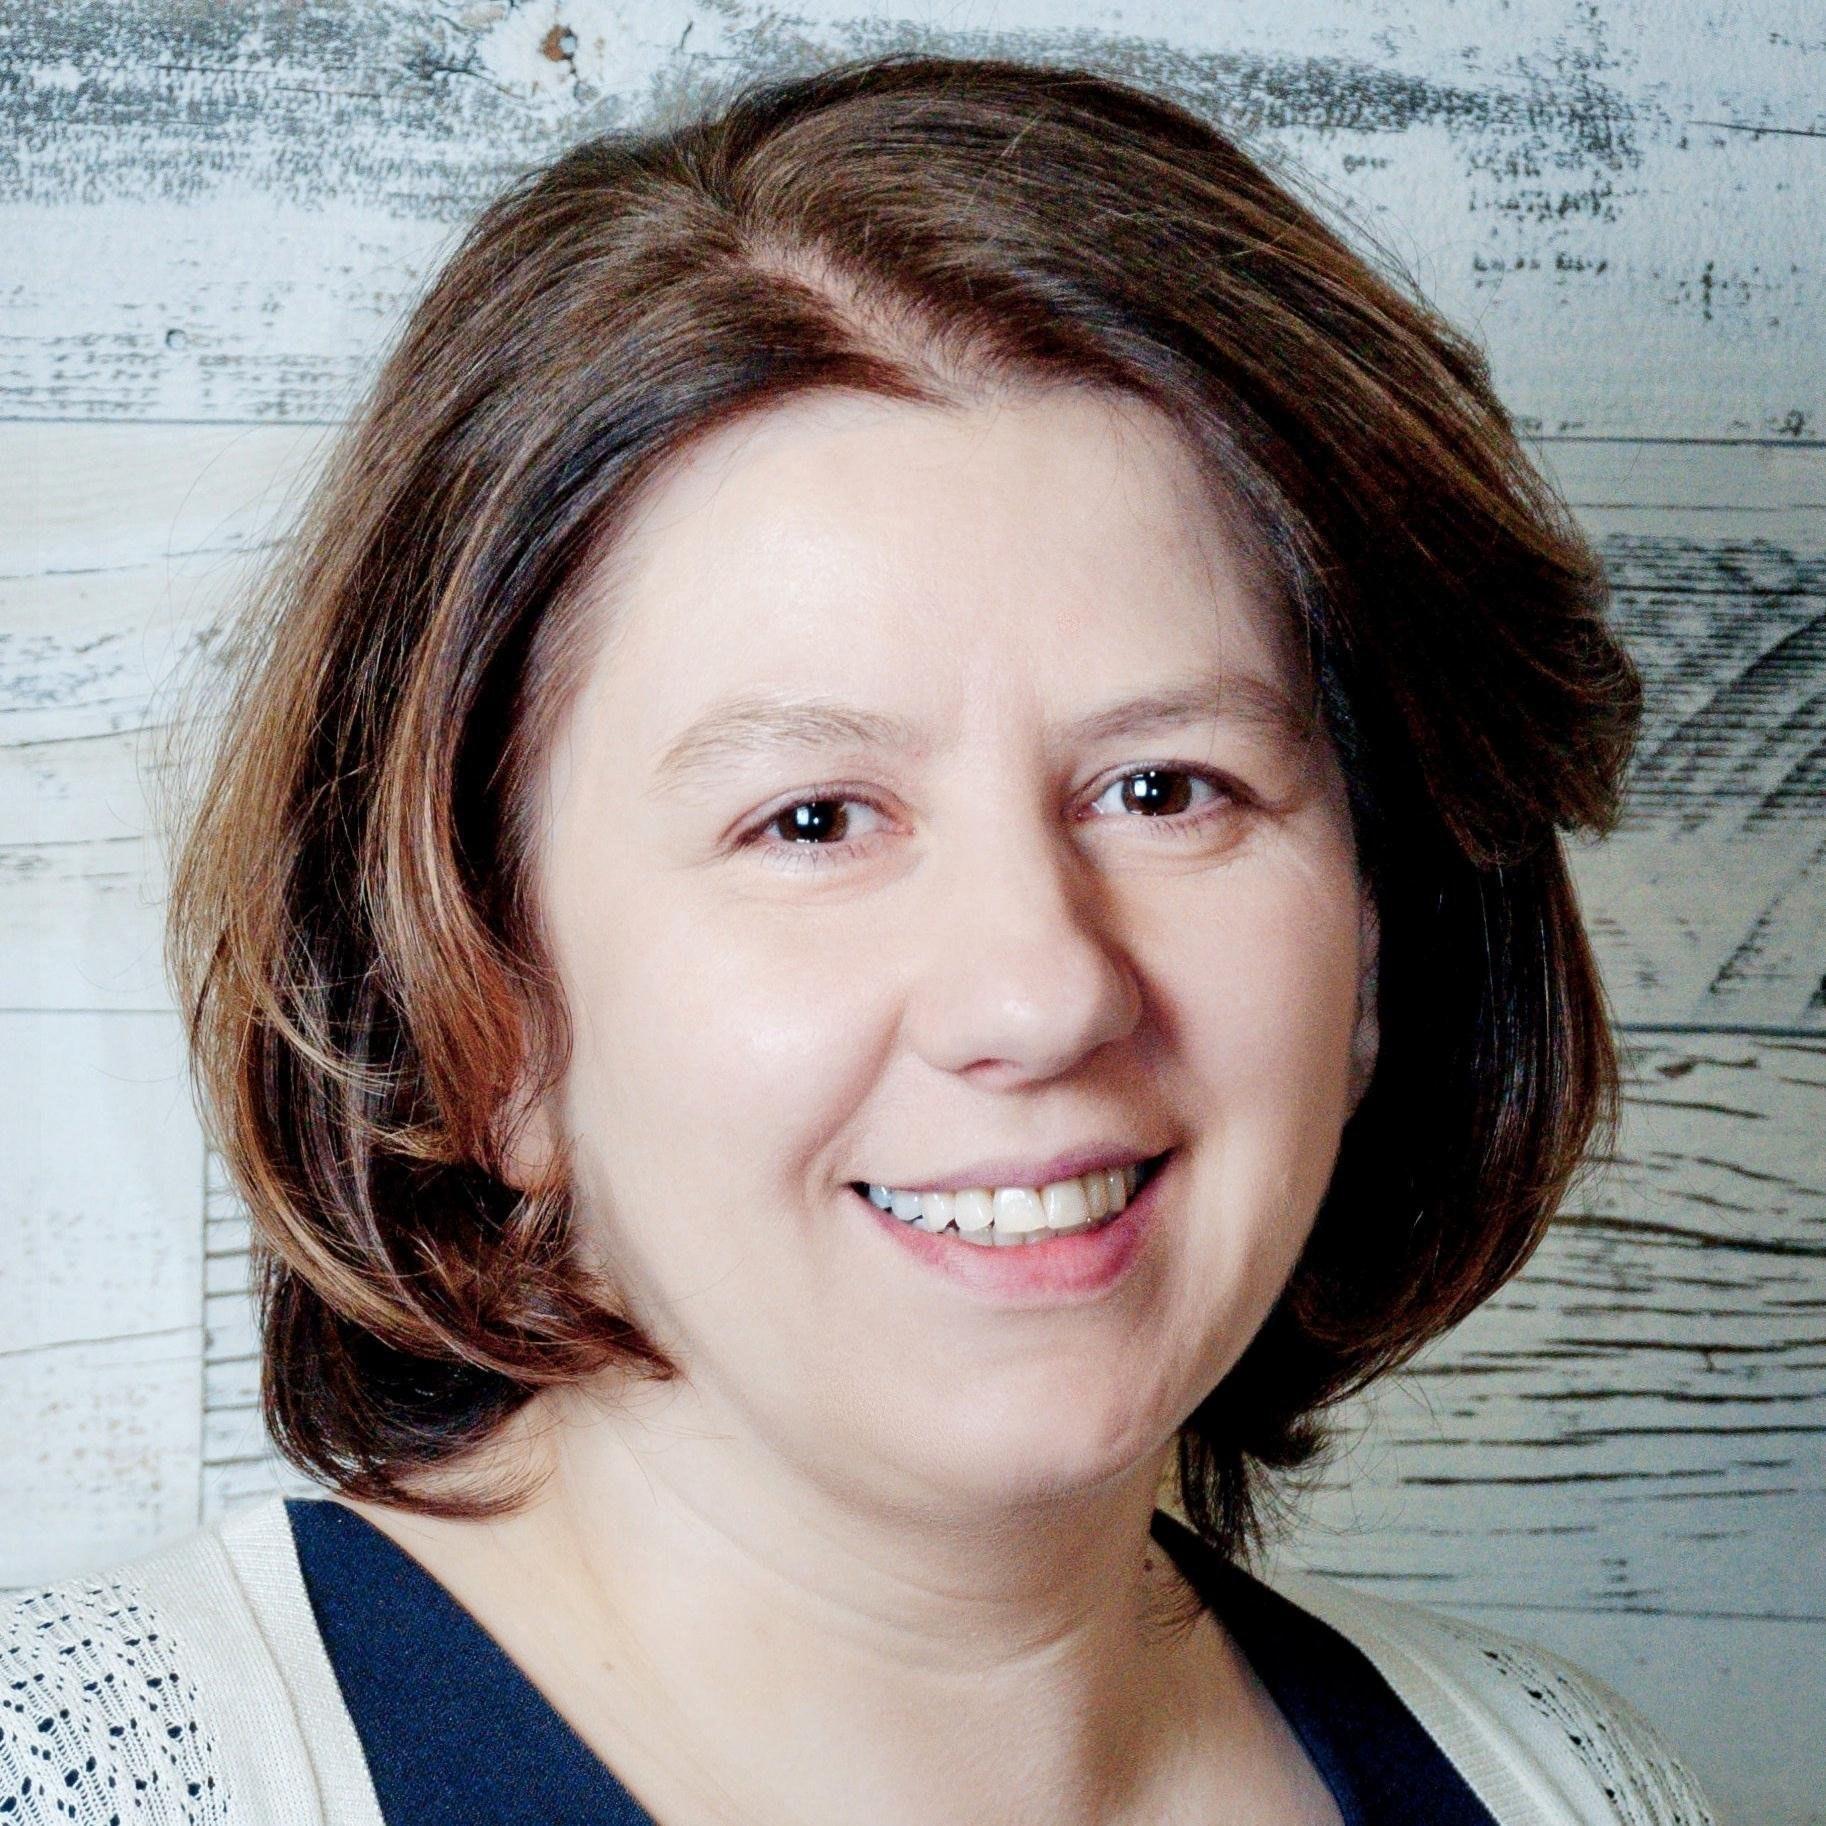 Irina Menn